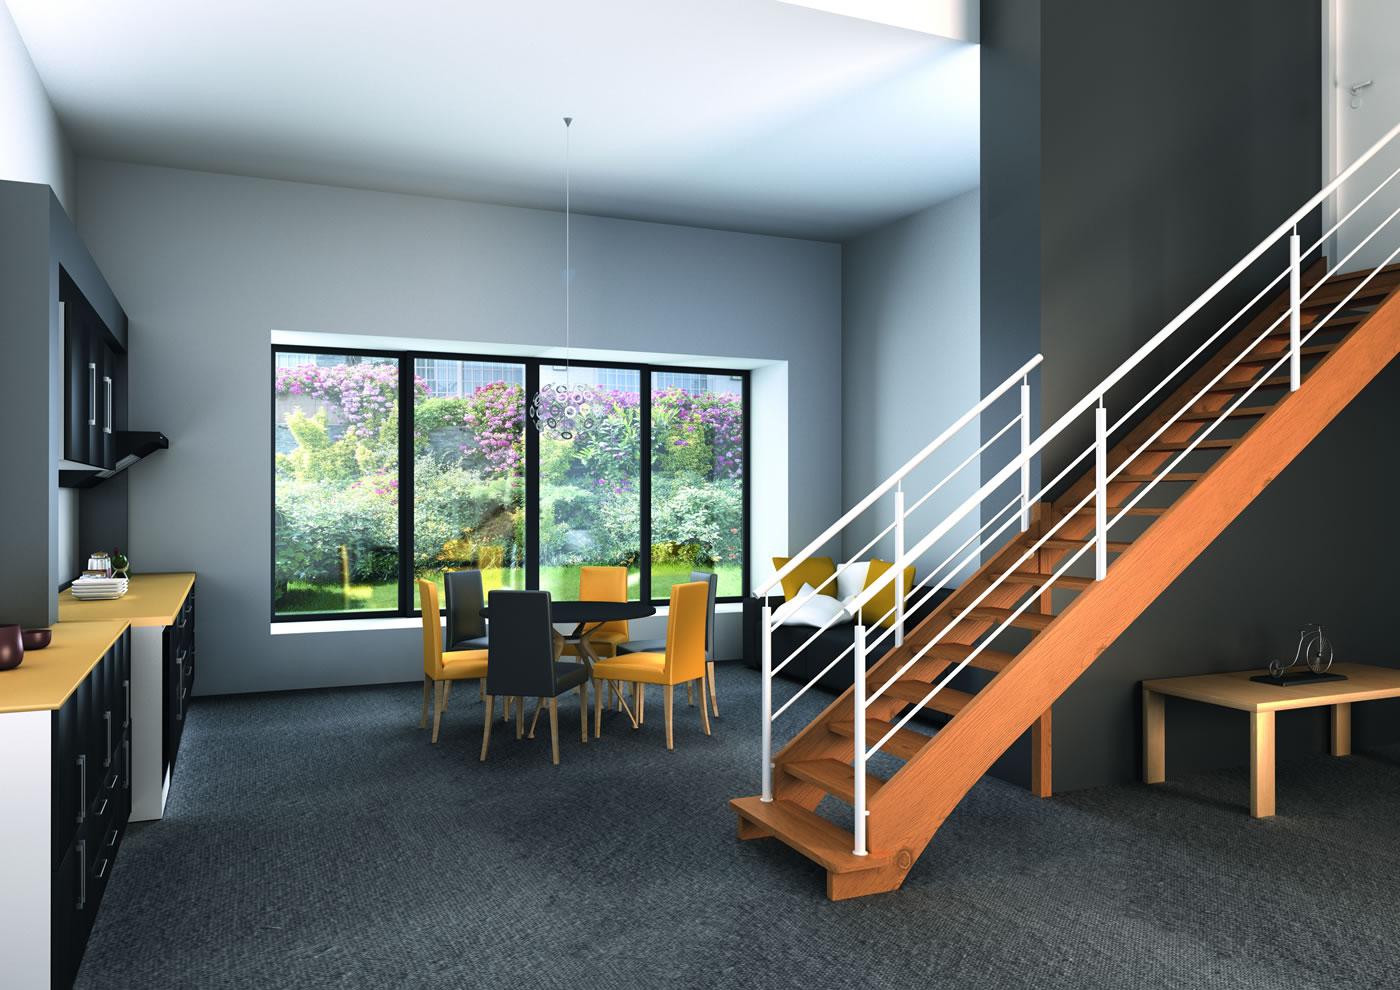 escaliers m talliques fusion groupe riaux escaliers. Black Bedroom Furniture Sets. Home Design Ideas